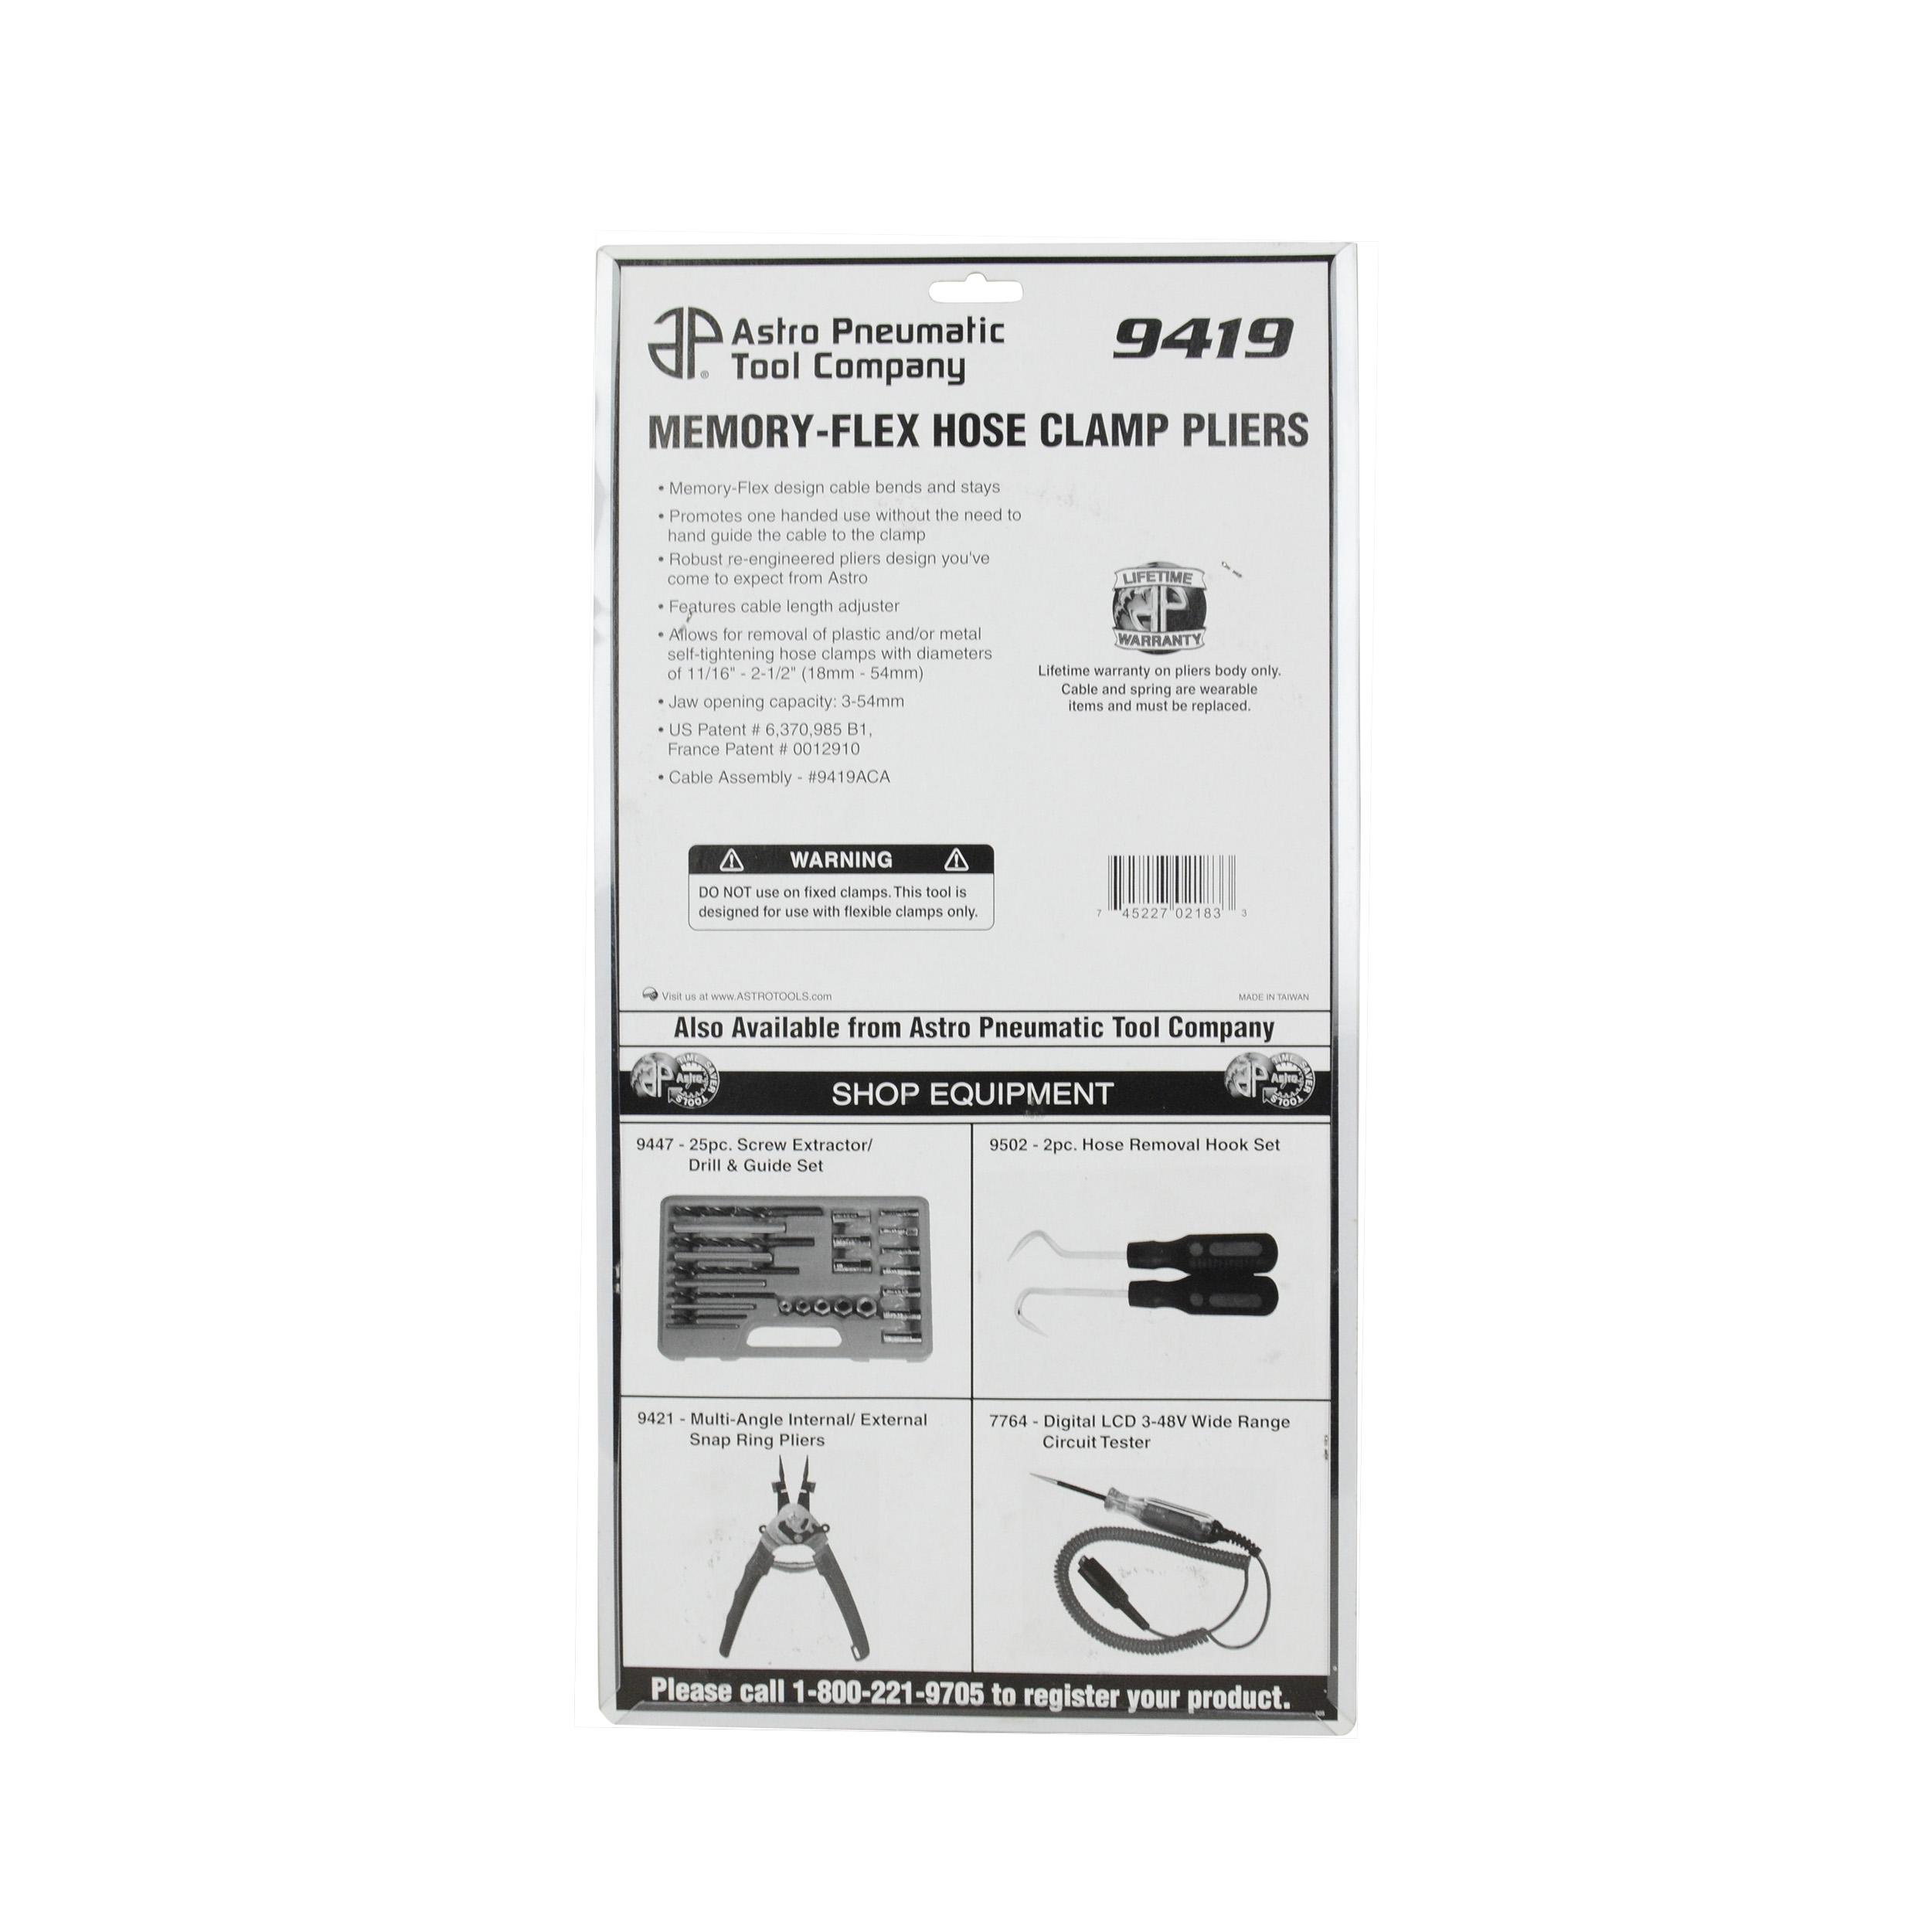 4895 Genuine SPARKPLUGS 5x NGK RACING SPARK PLUGS Part Number R7435-8 Stock No